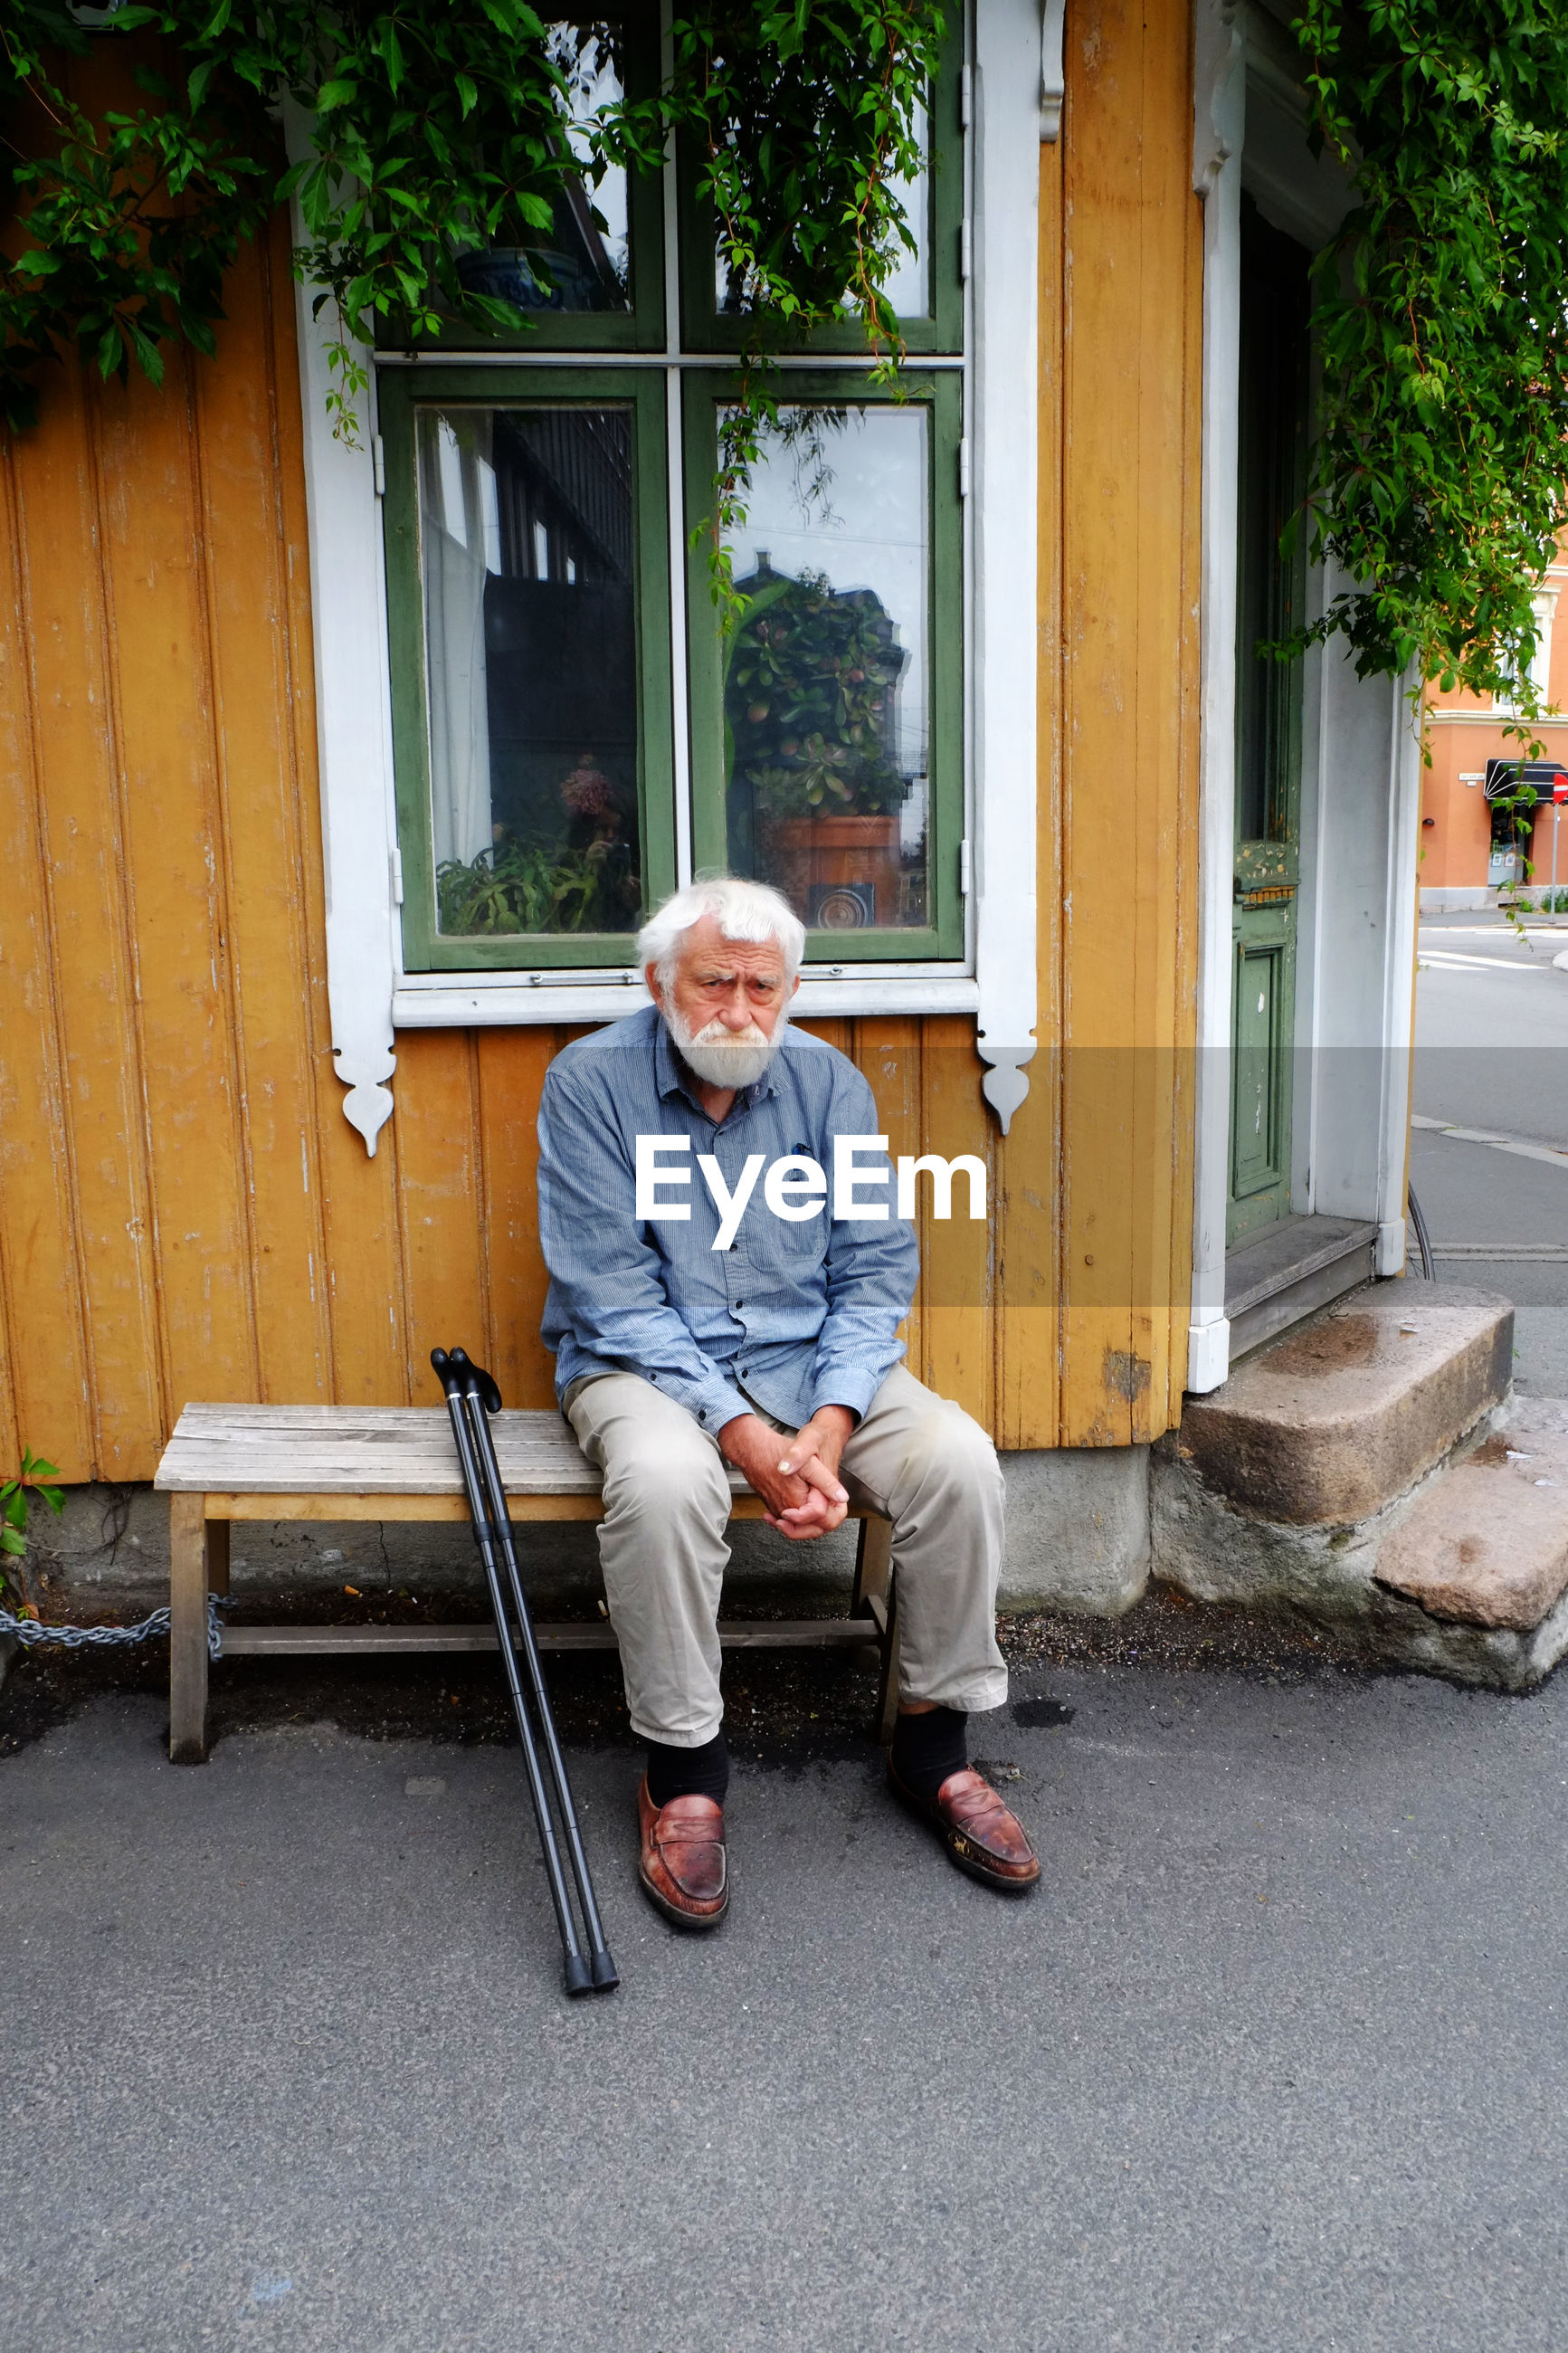 Full length of senior man sitting on bench by house